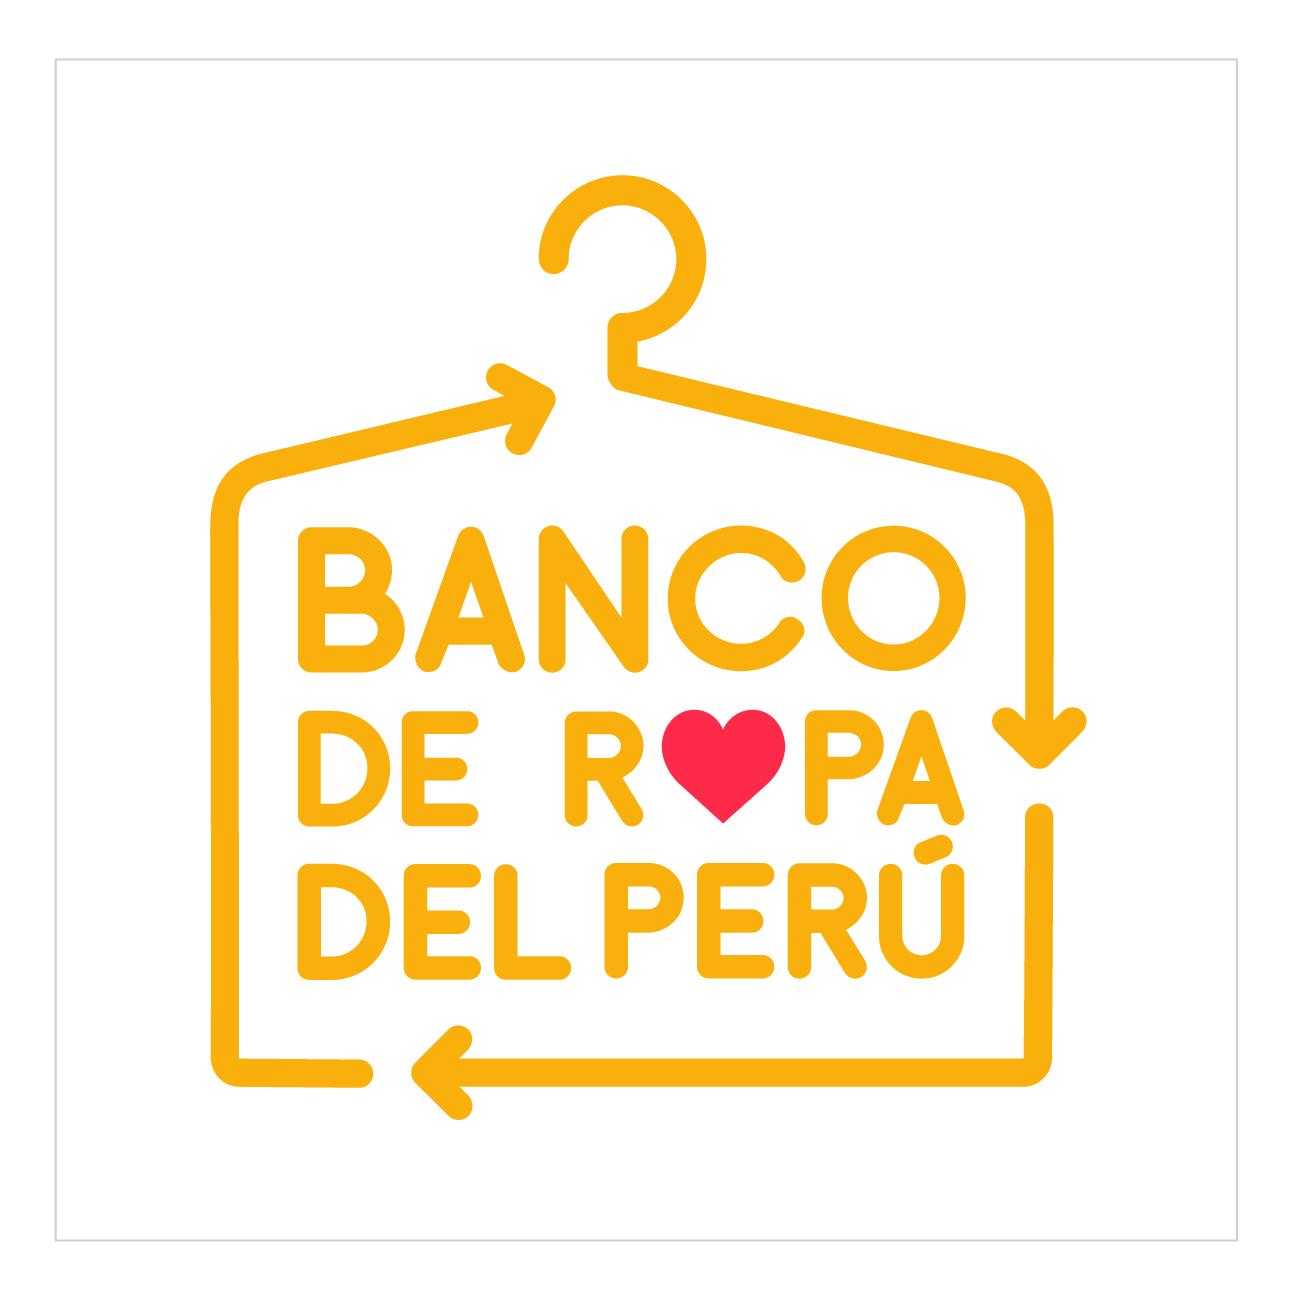 Logo 002 Banco de Ropa.png